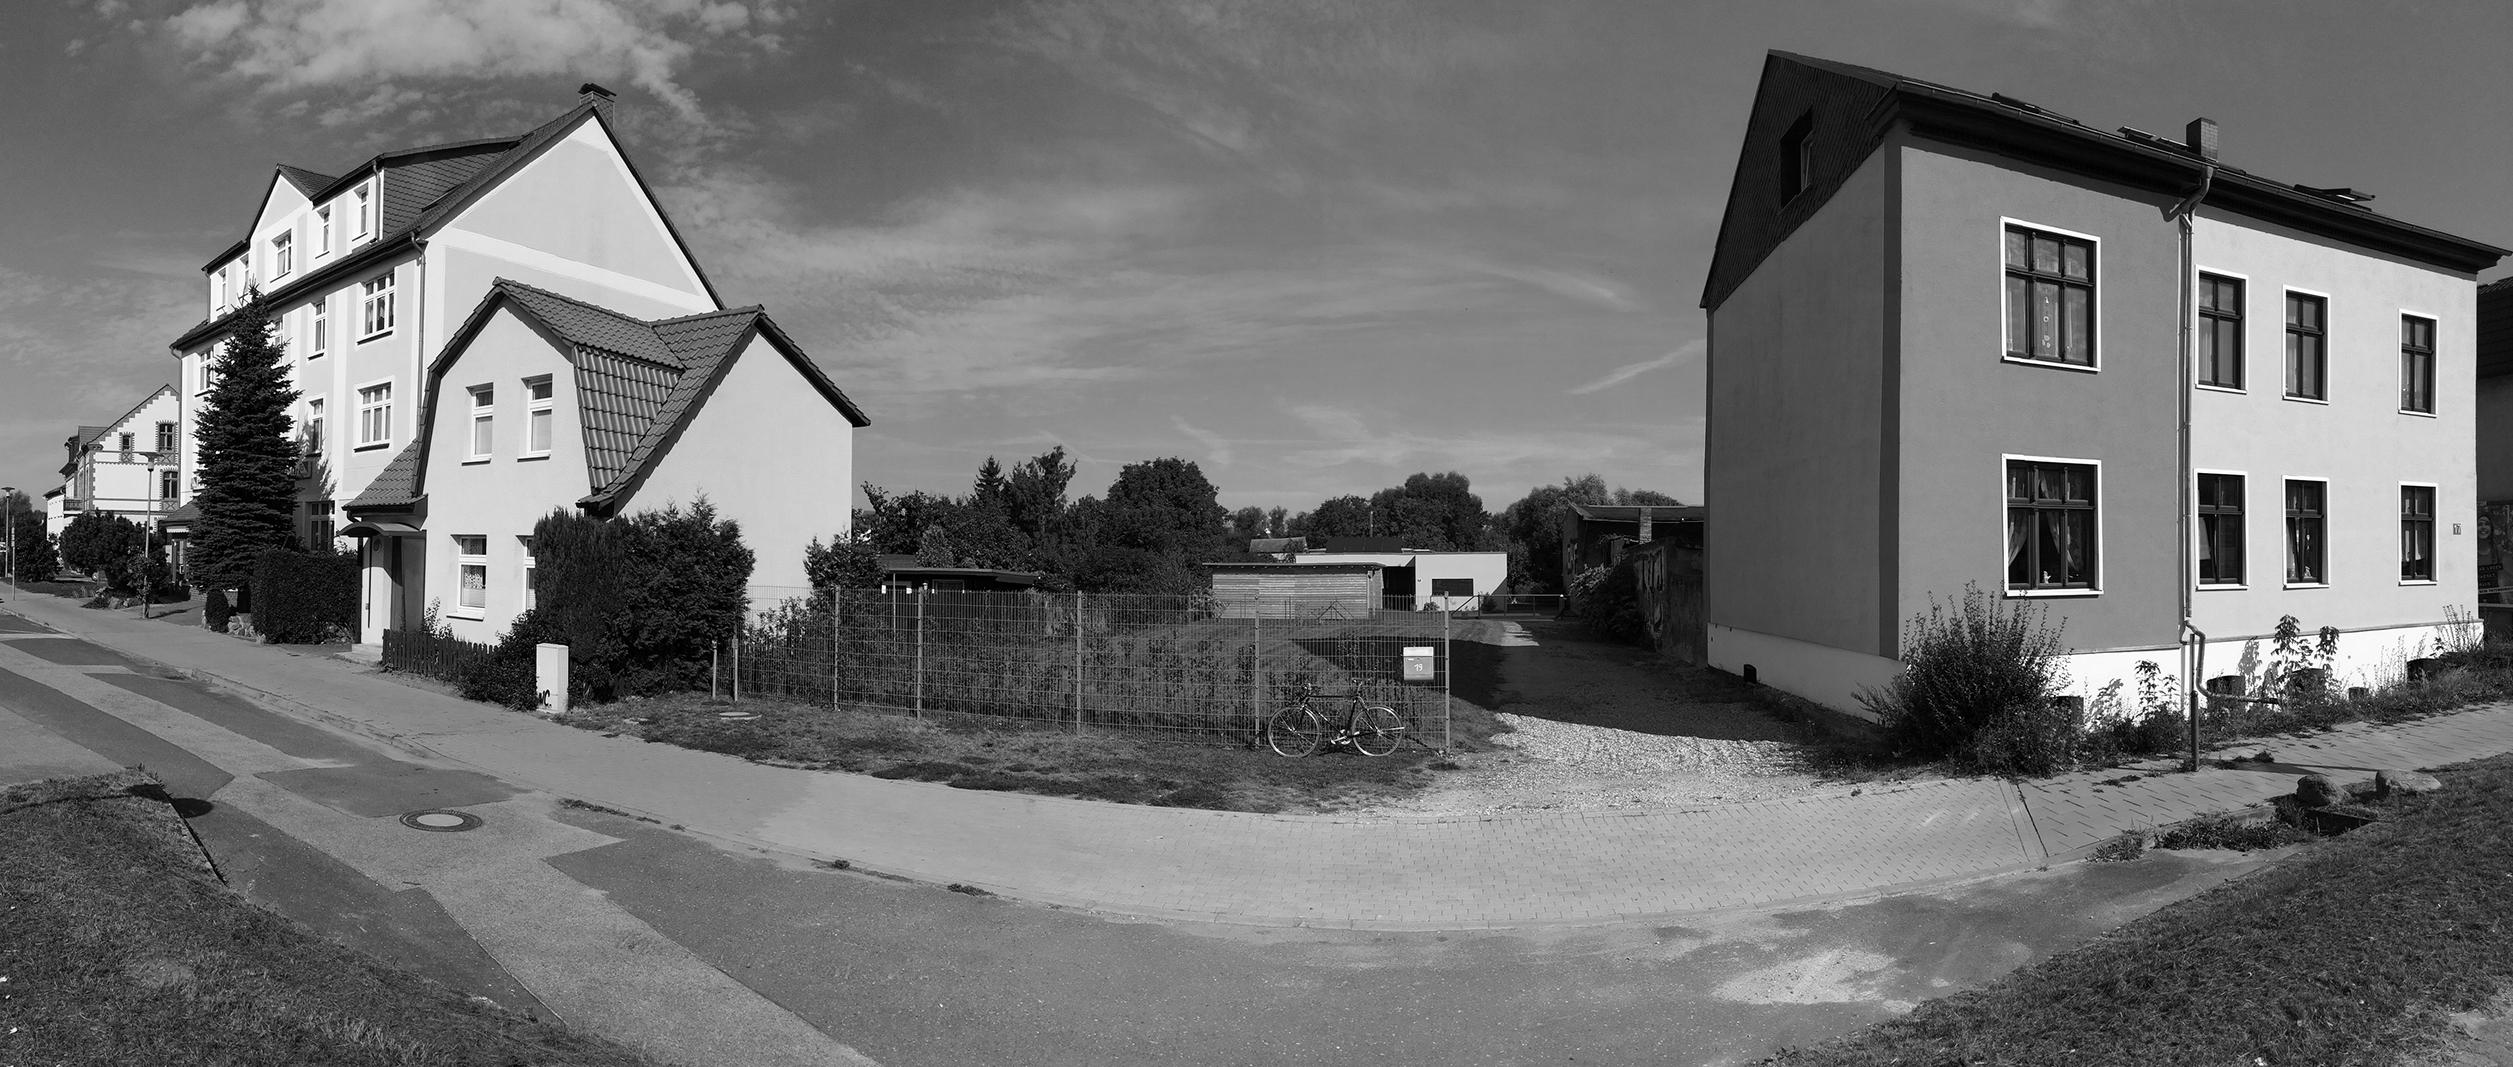 Rostocker Strasse, site